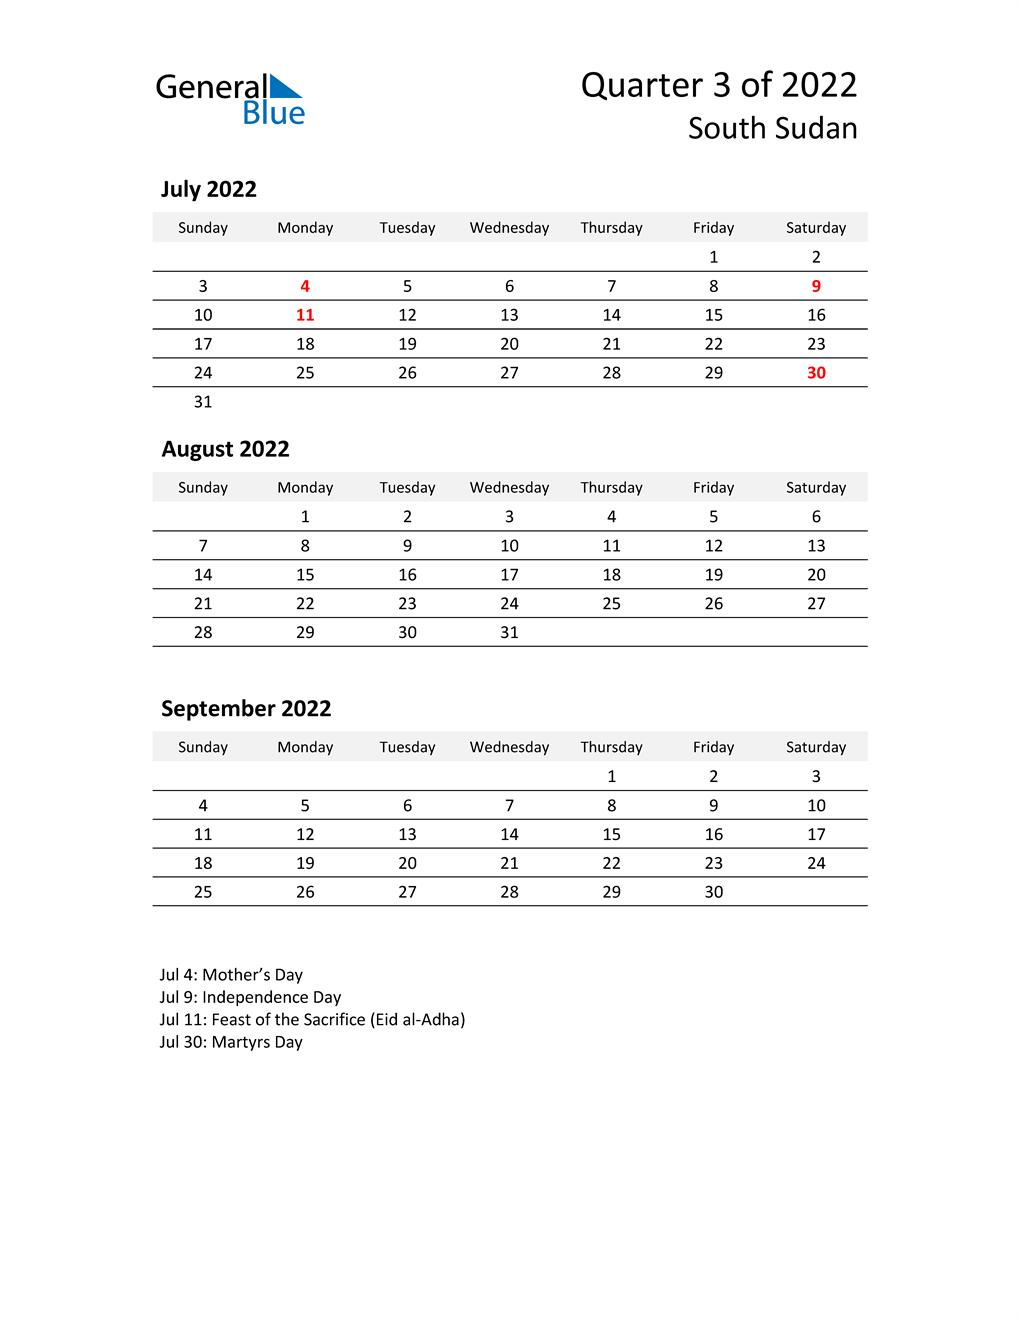 2022 Three-Month Calendar for South Sudan